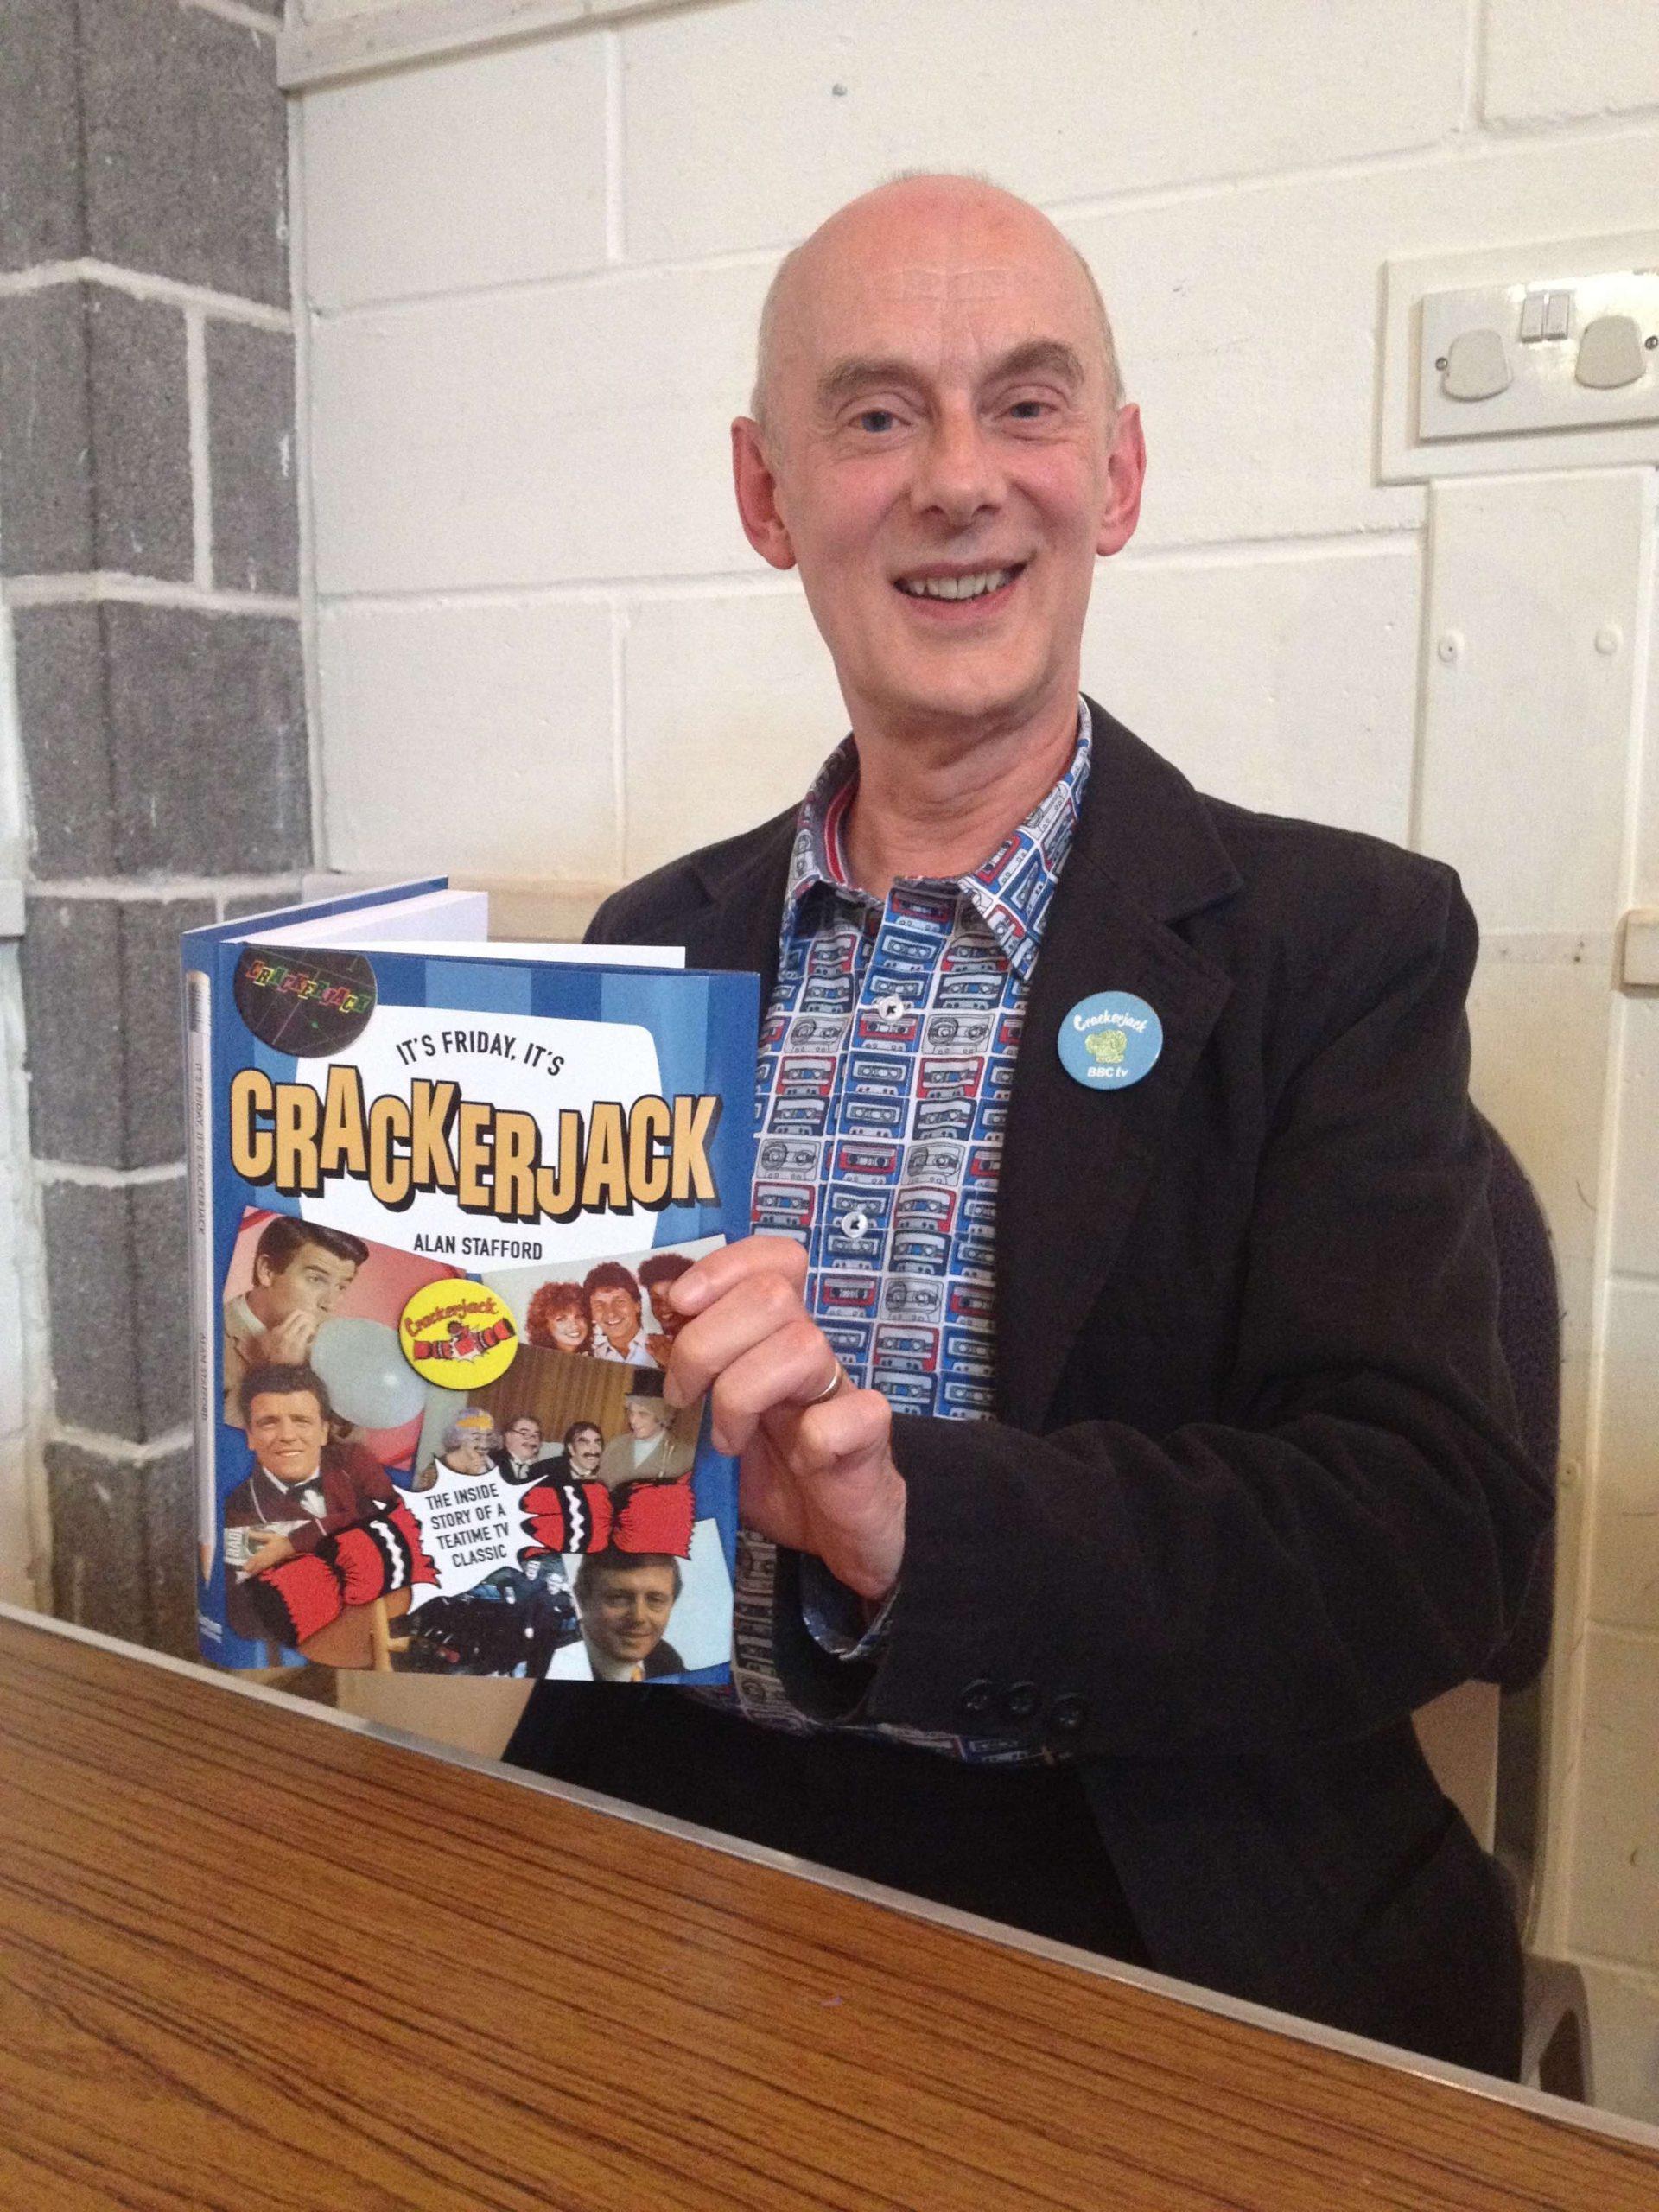 Alan Stafford Crackerjack book launch